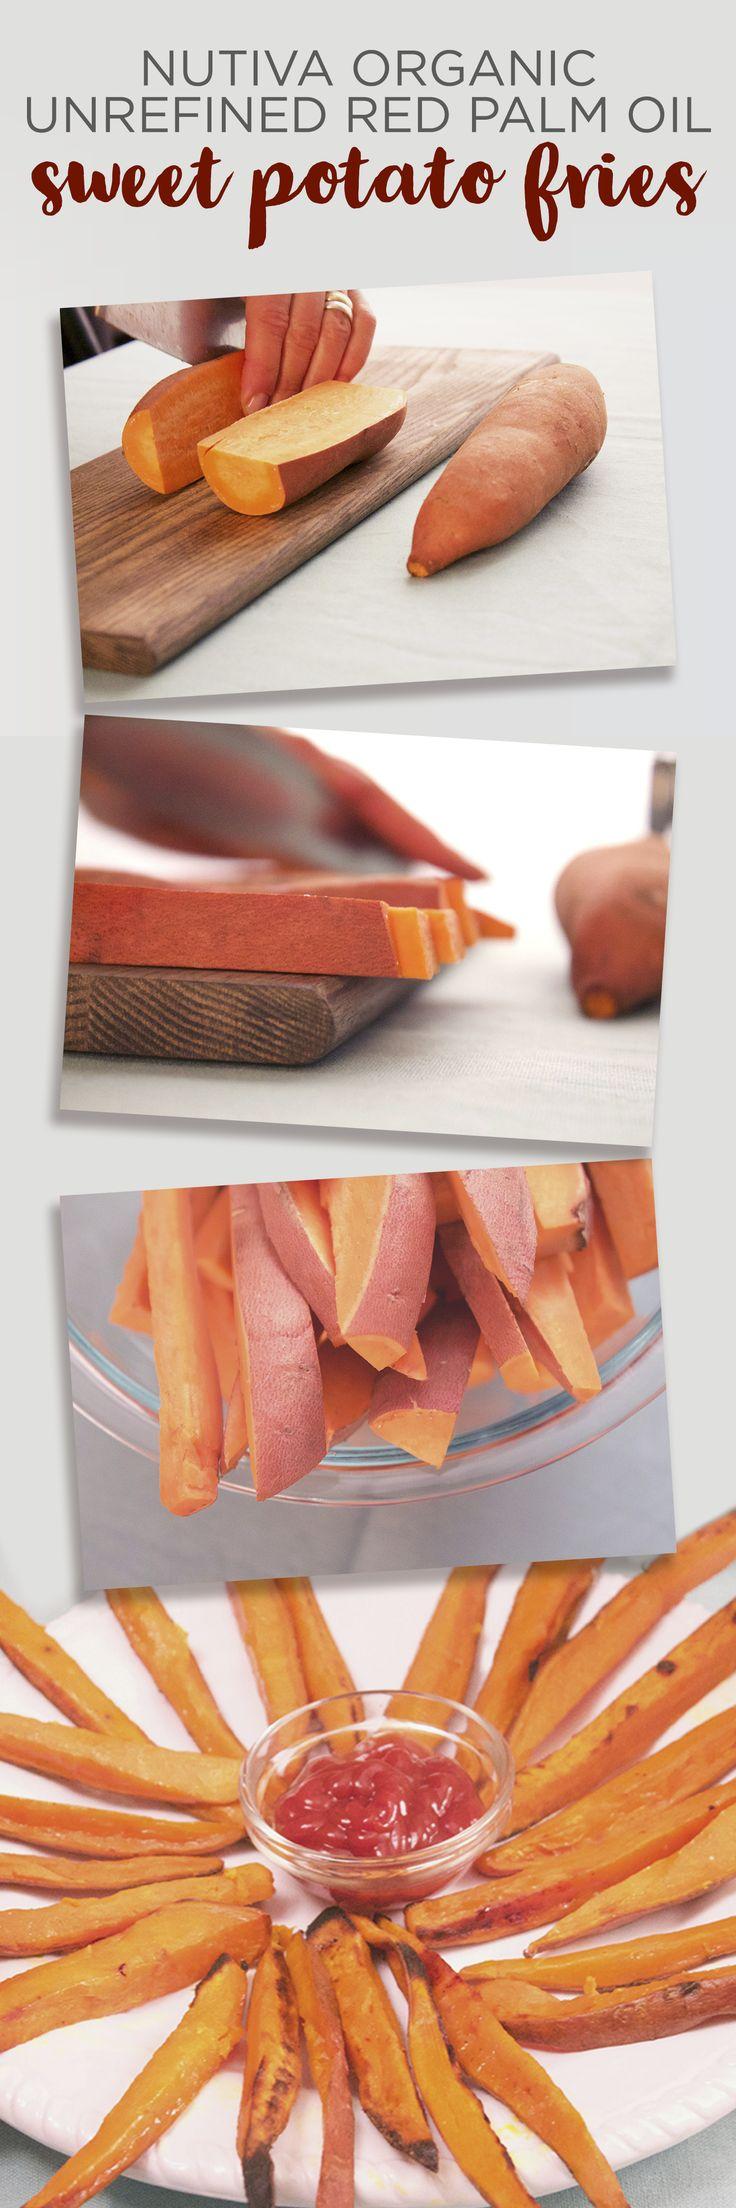 Red Palm Oil Sweet Potato Fries kitchen.nutiva.com